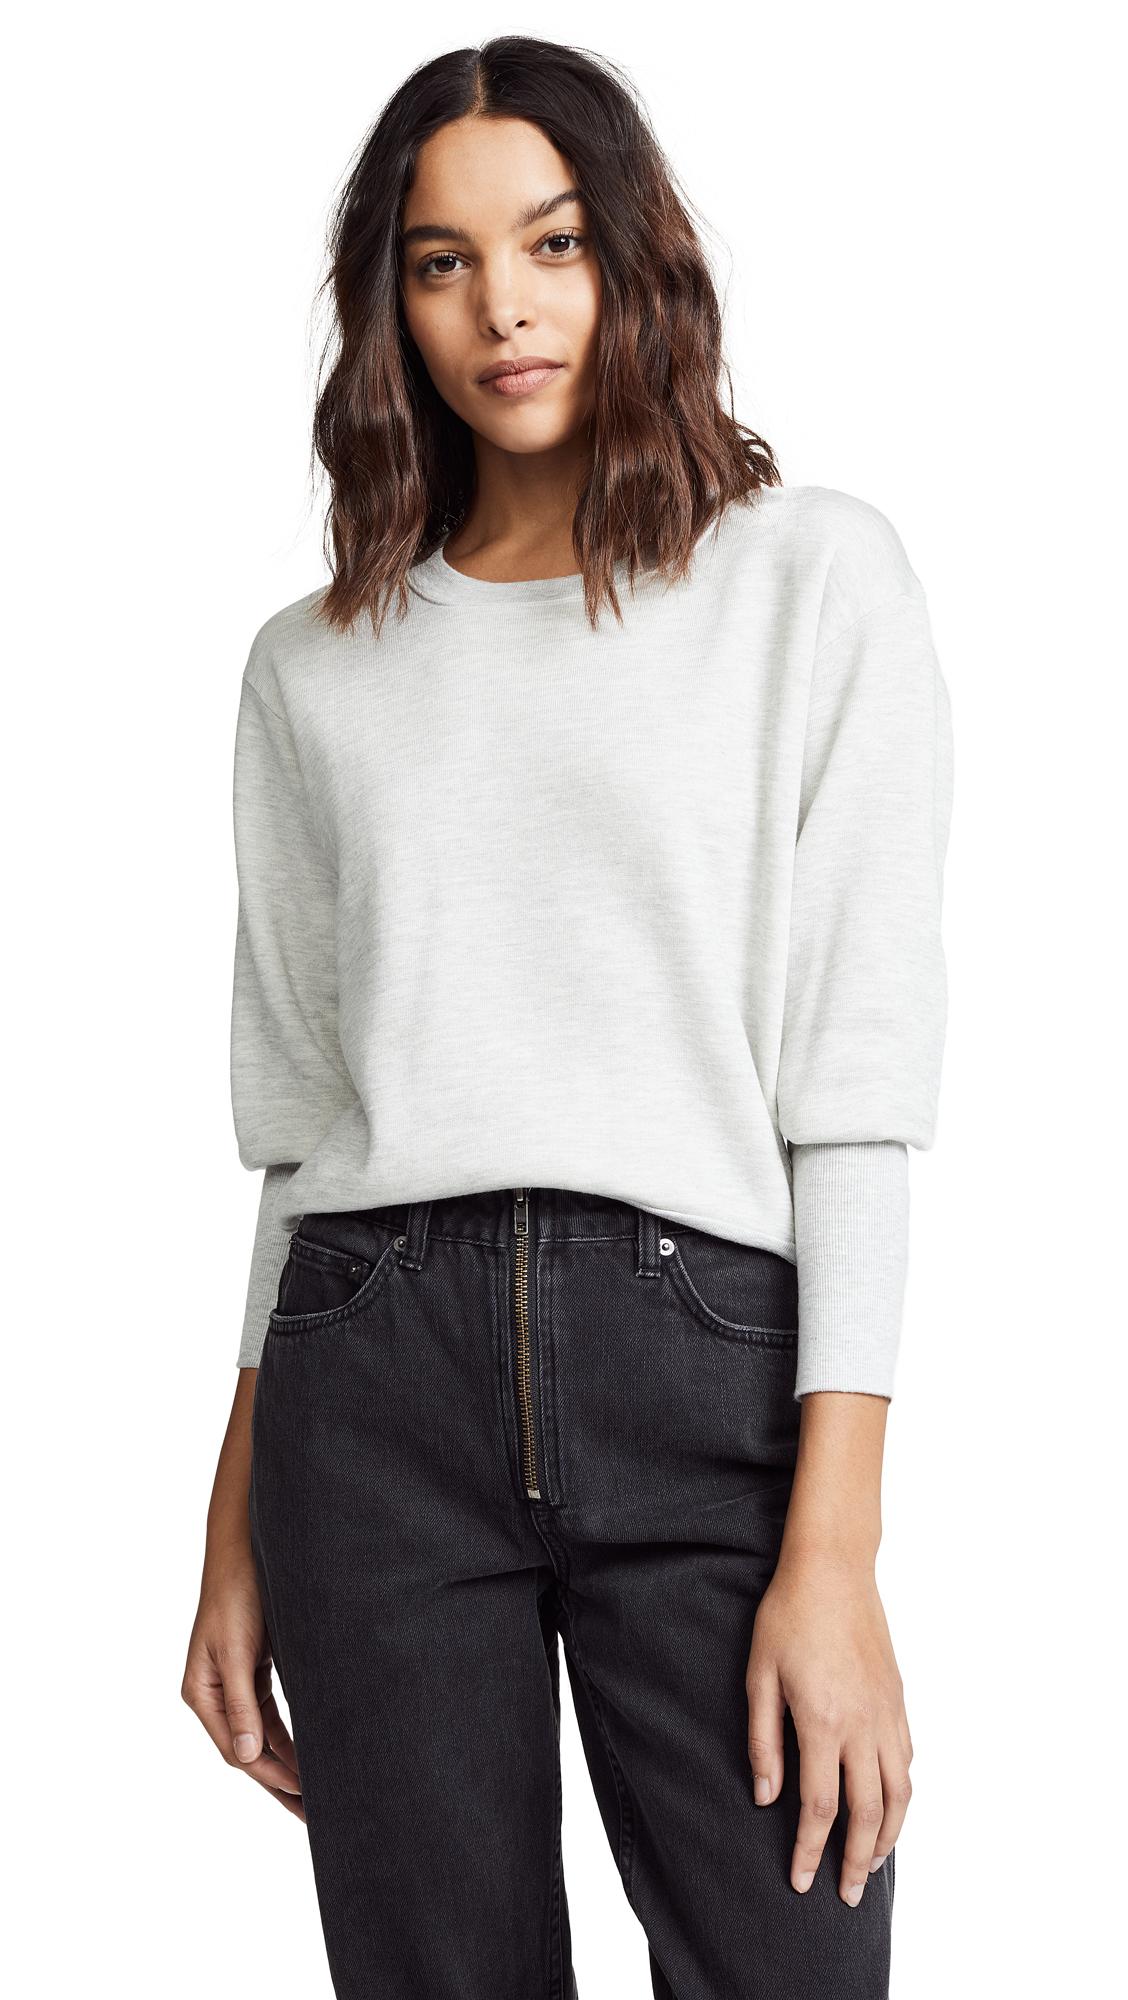 NATION LTD Coco Cuffed Sweatshirt in Light Heather Grey